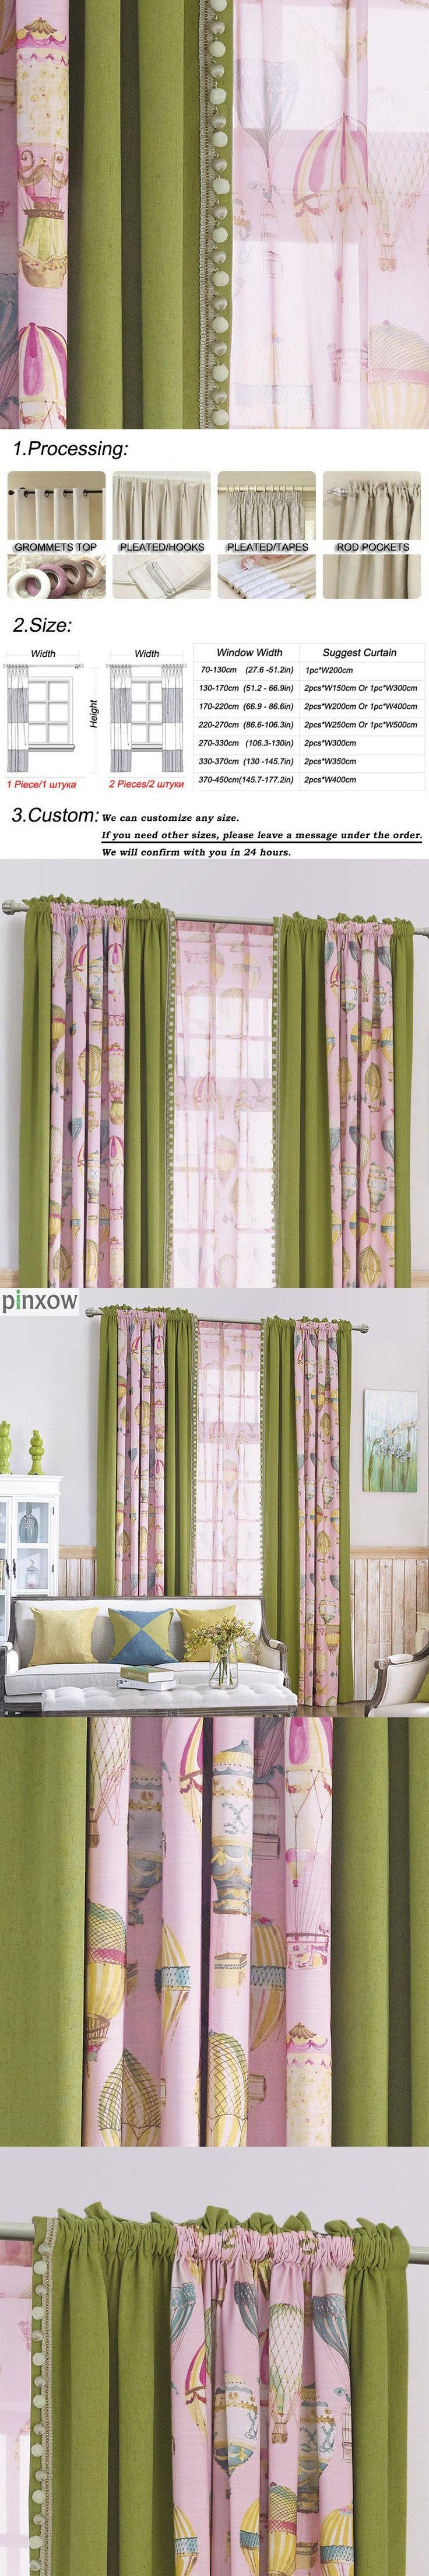 Lace Bedroom Window Curtains Children Room Semi Blackout Baby Kid Home Panels Green Pink Boy Girl Drapes Cartoon Room Darkening